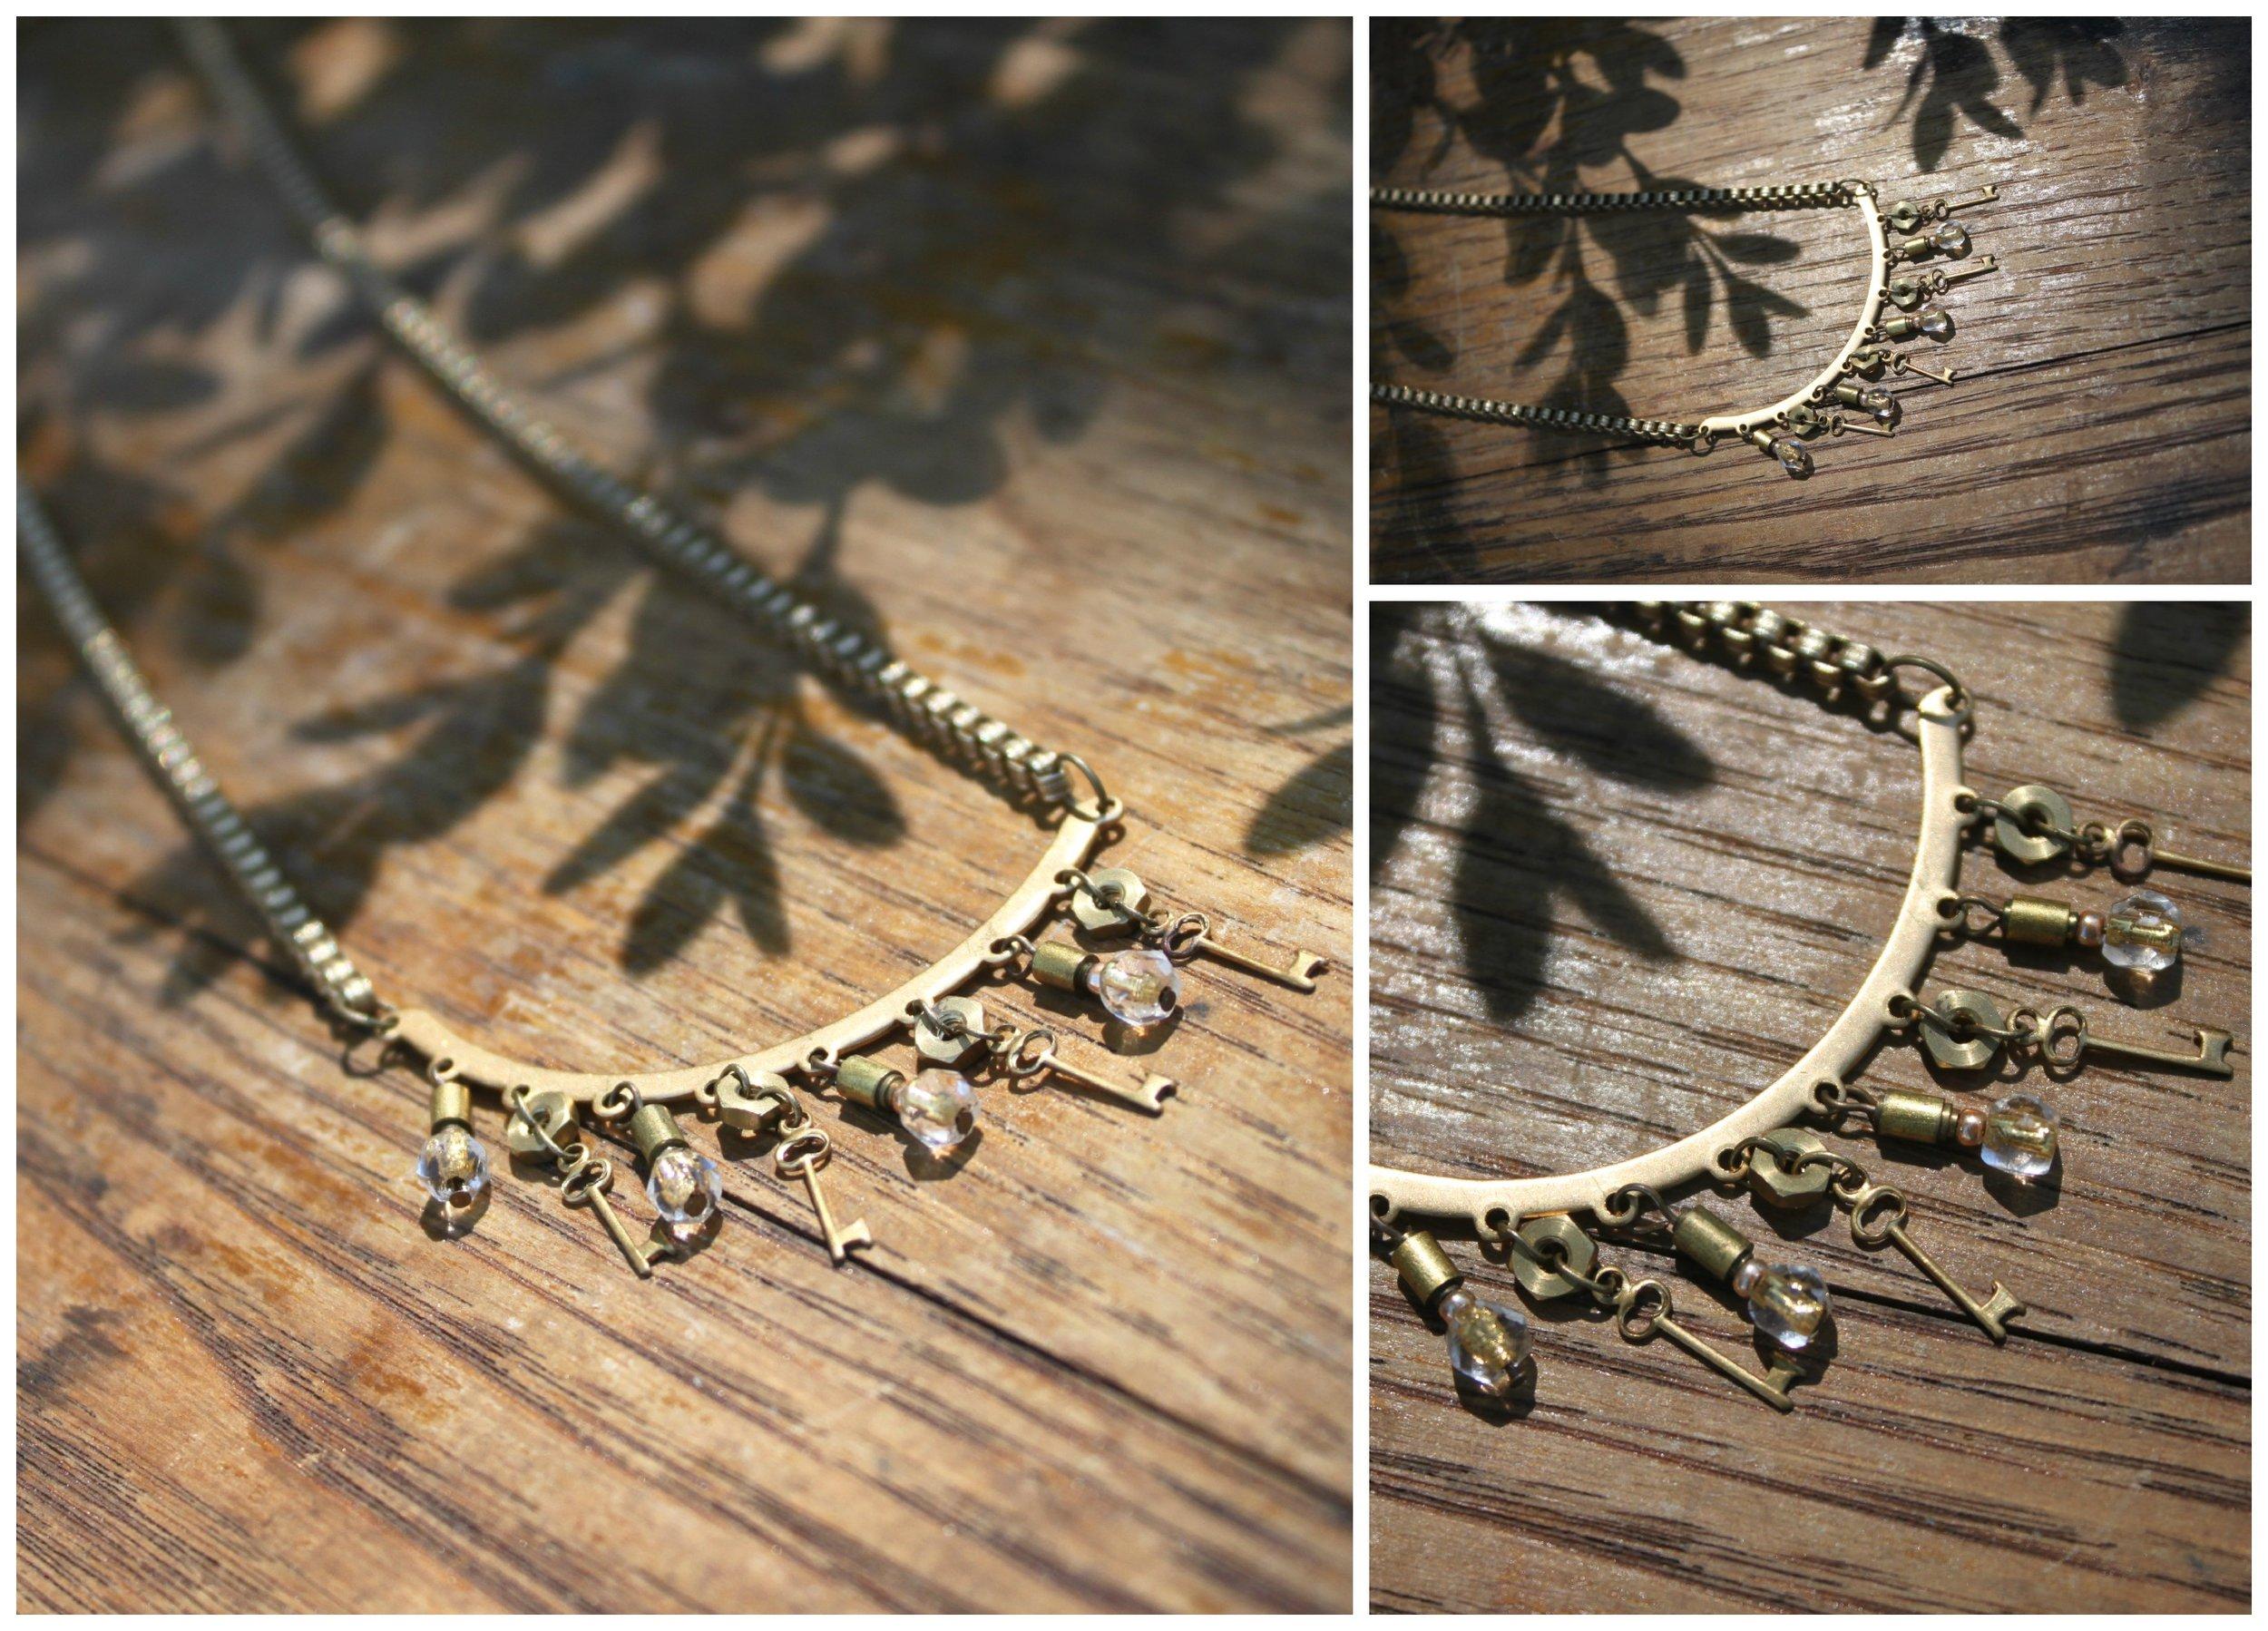 Steampunk Golden Key Necklace Collage